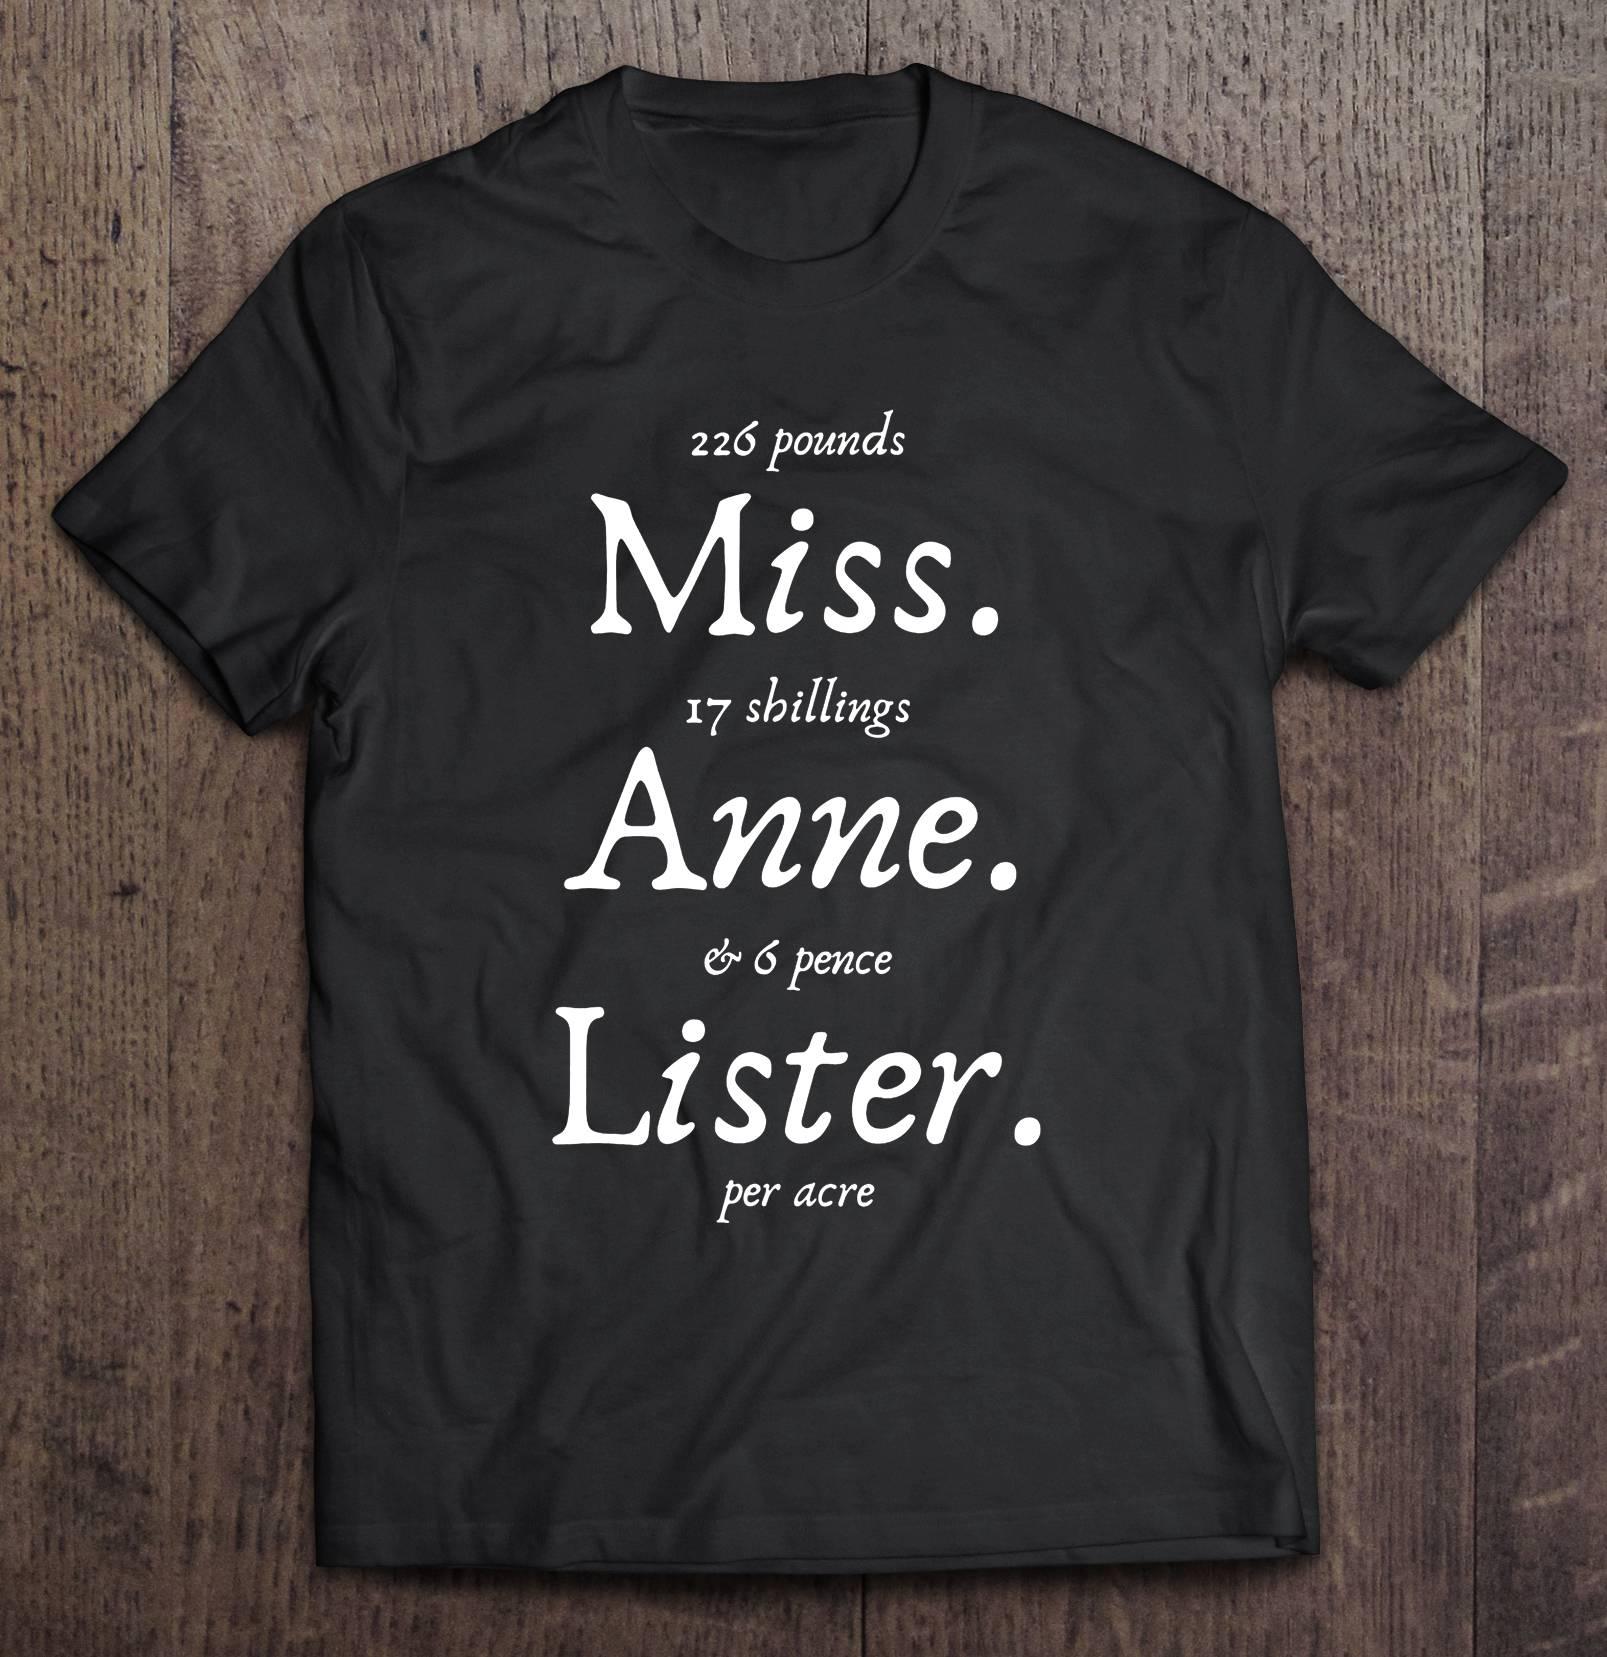 226 libras miss 17 shillings anne 6 pence lister por acre t-shirts